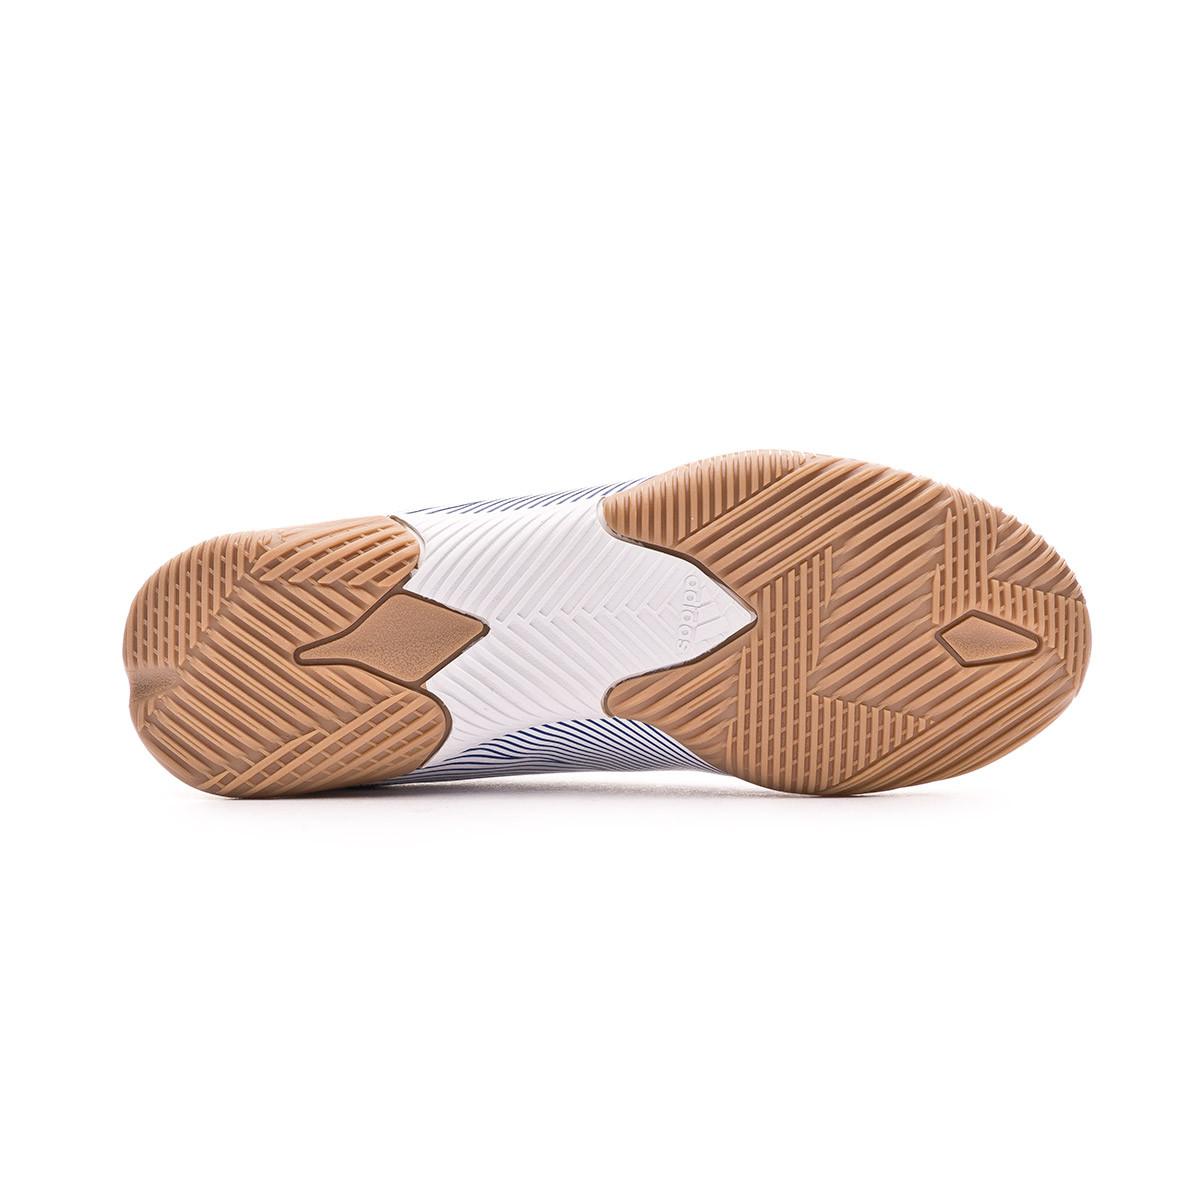 chuteira adidas 41 fut sintetico 【 OFERTAS 】   Vazlon Brasil